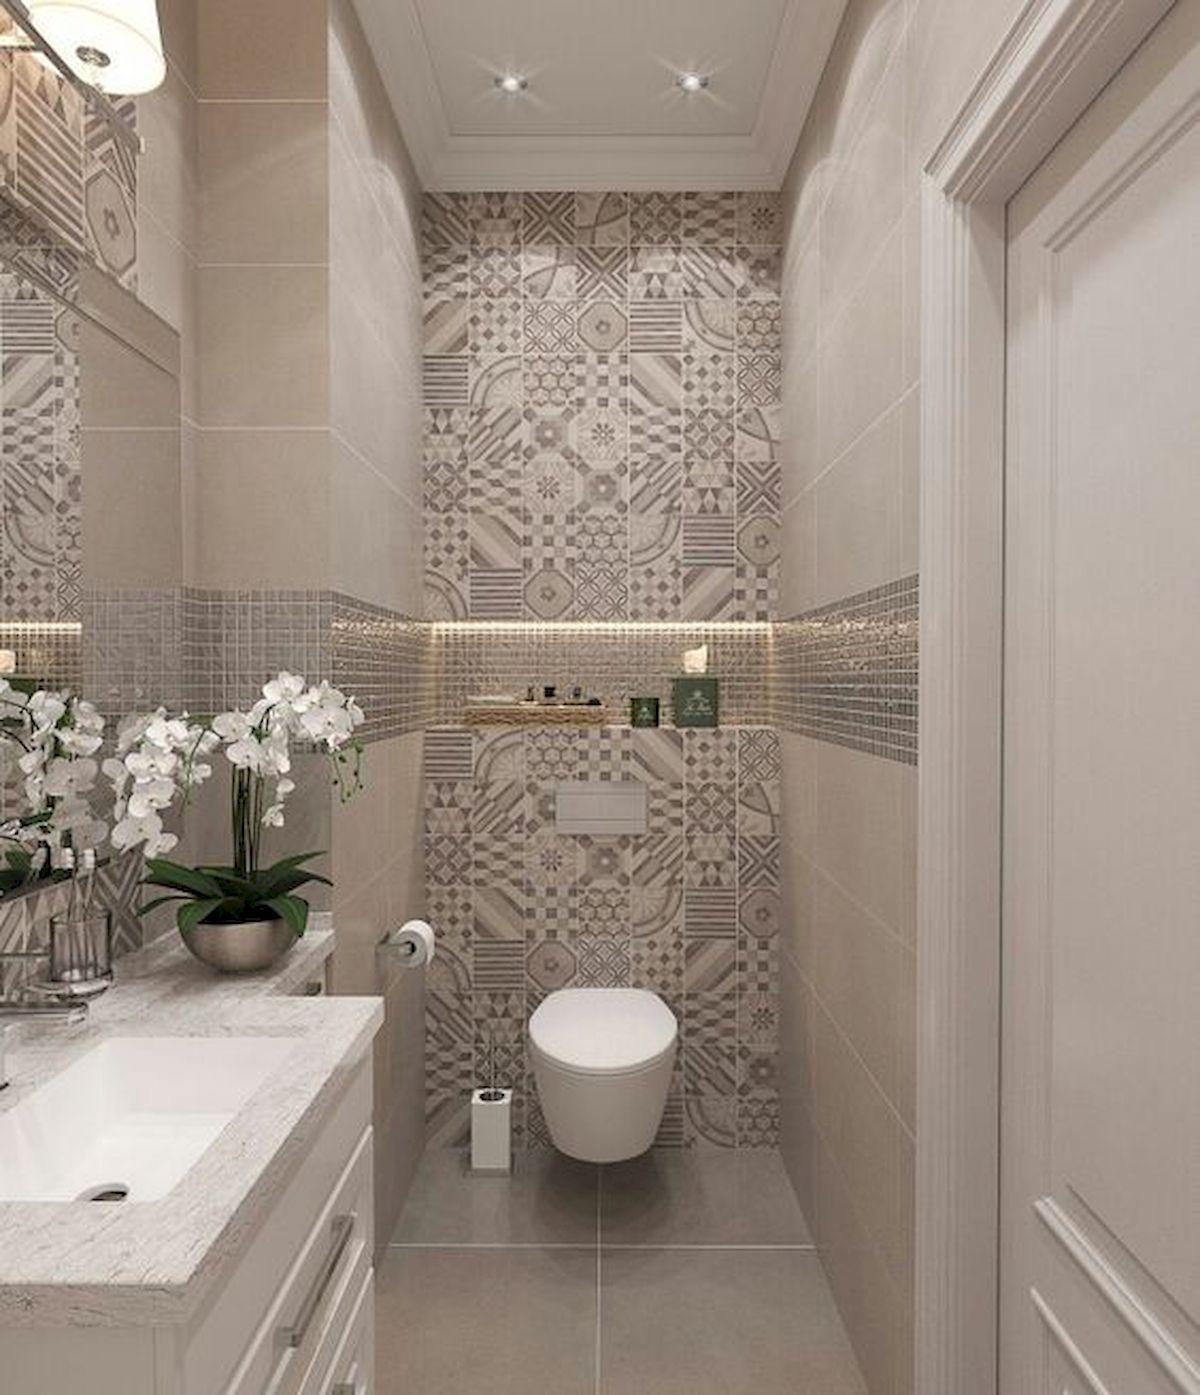 18 Fresh Small Master Bathroom Remodel Ideas And Design  Idée